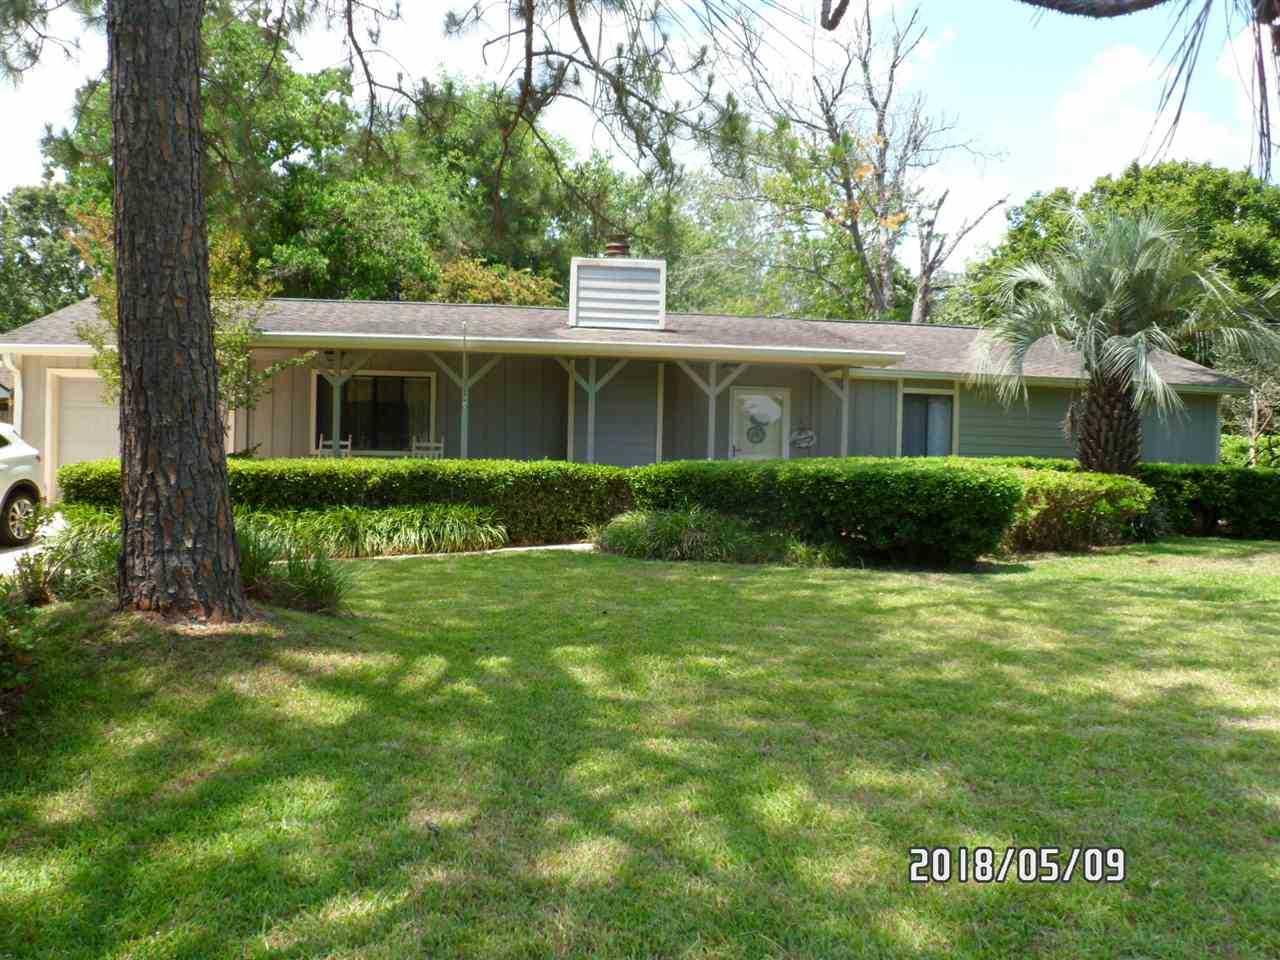 6658 Man O War Trl Tallahassee, FL 32309 in Killearn Acres Photo 1